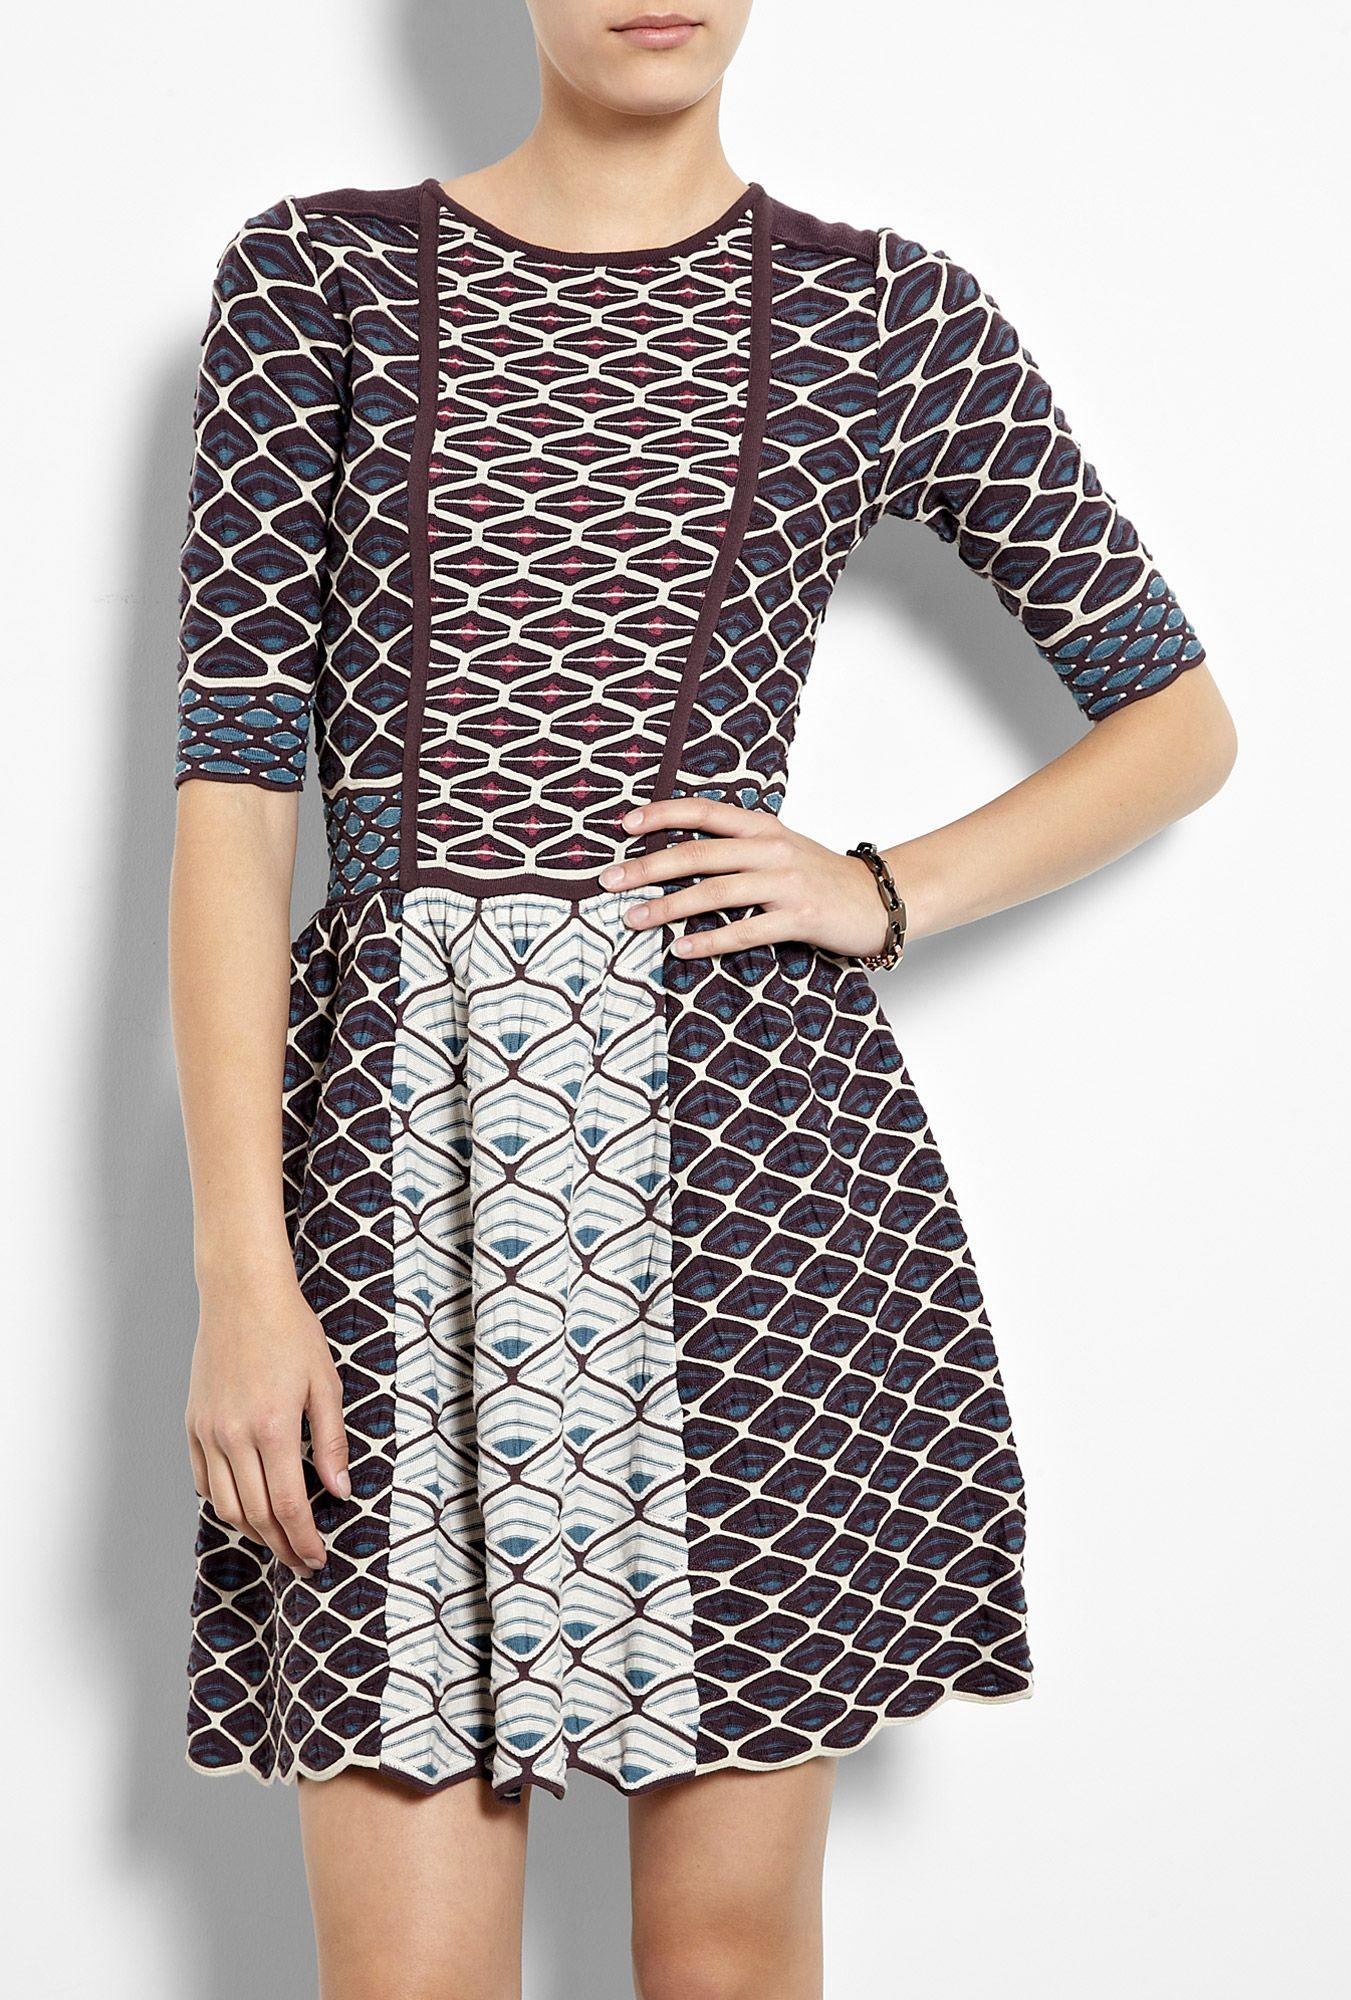 6a5b2cf140fa Shell Collage Knit Dress by M Missoni.....uh